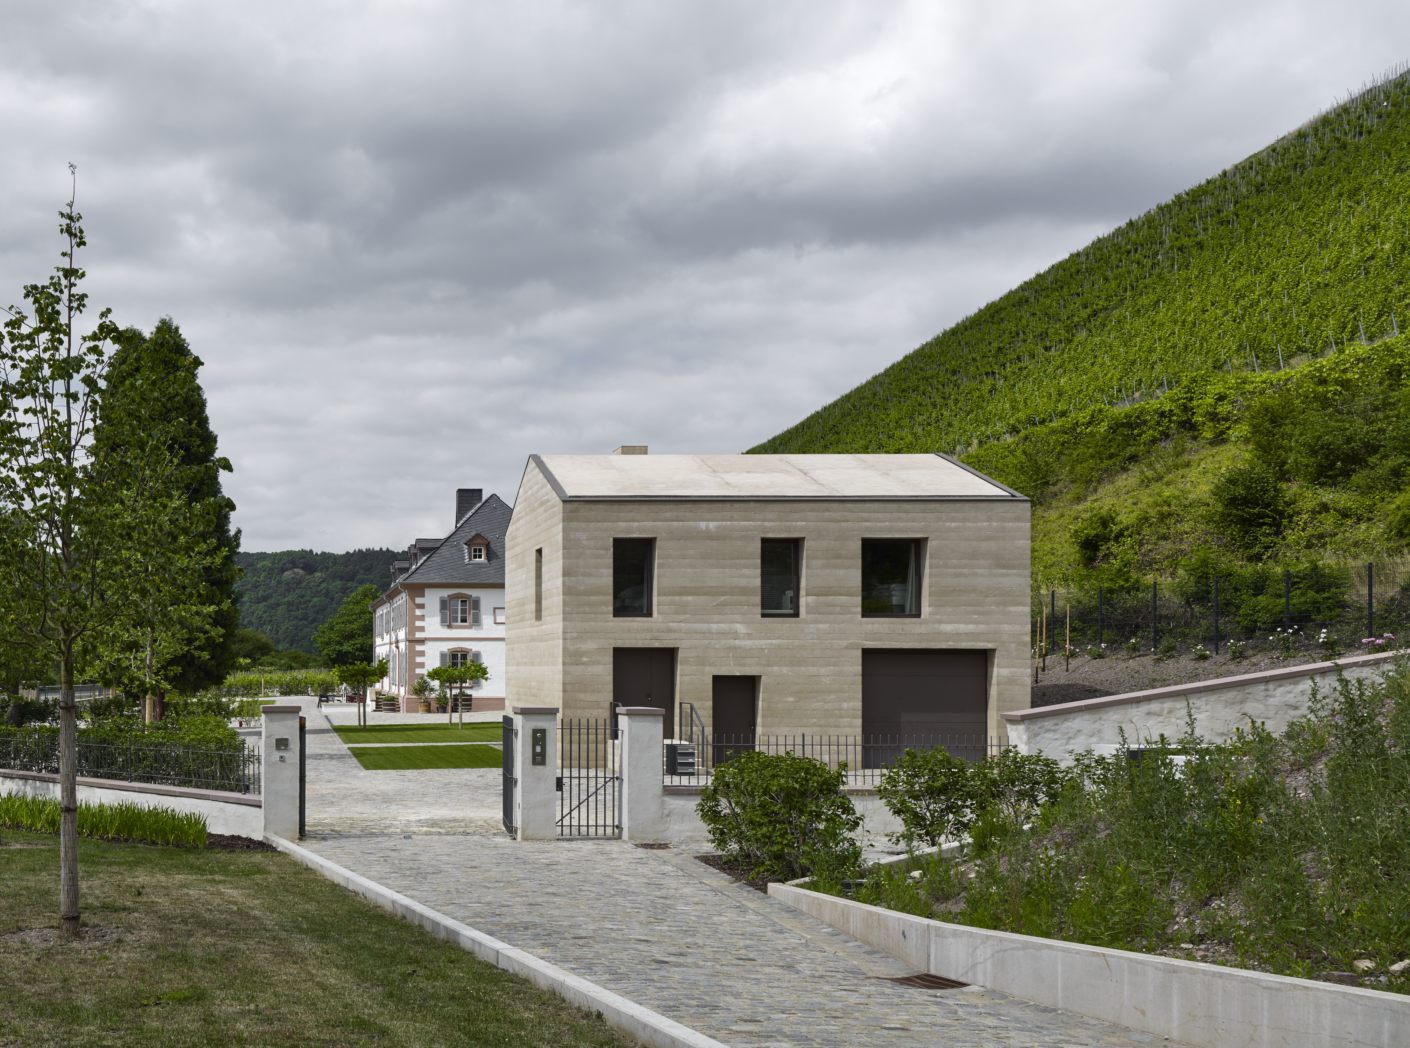 Max Dudler, Cantzheim, Kanzem, Stylepark